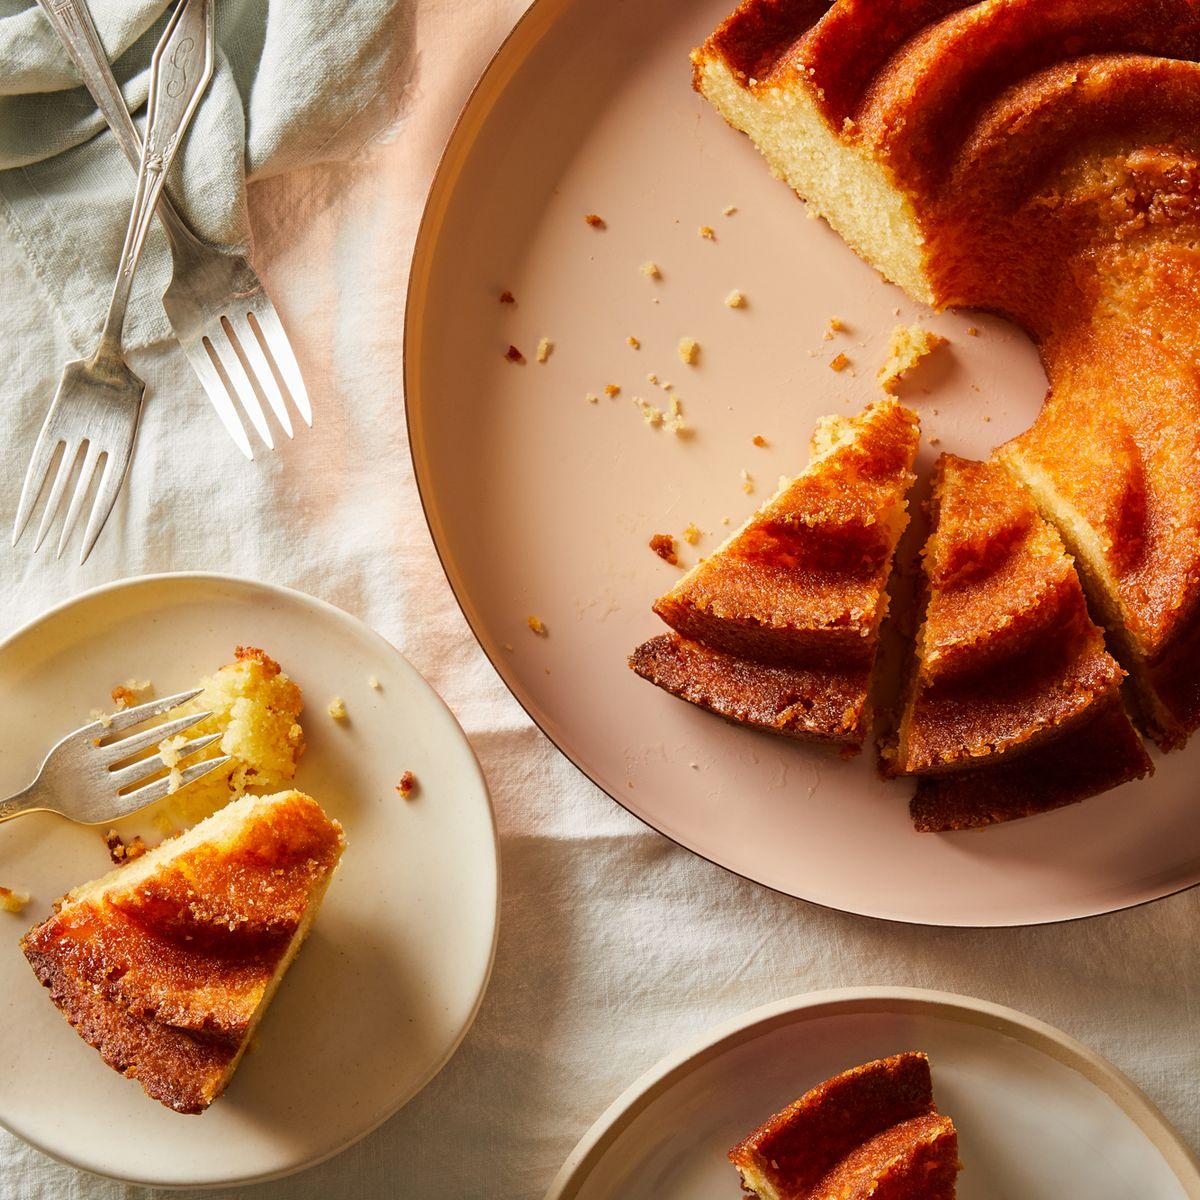 Maida Heatter's Lemon Buttermilk Cake